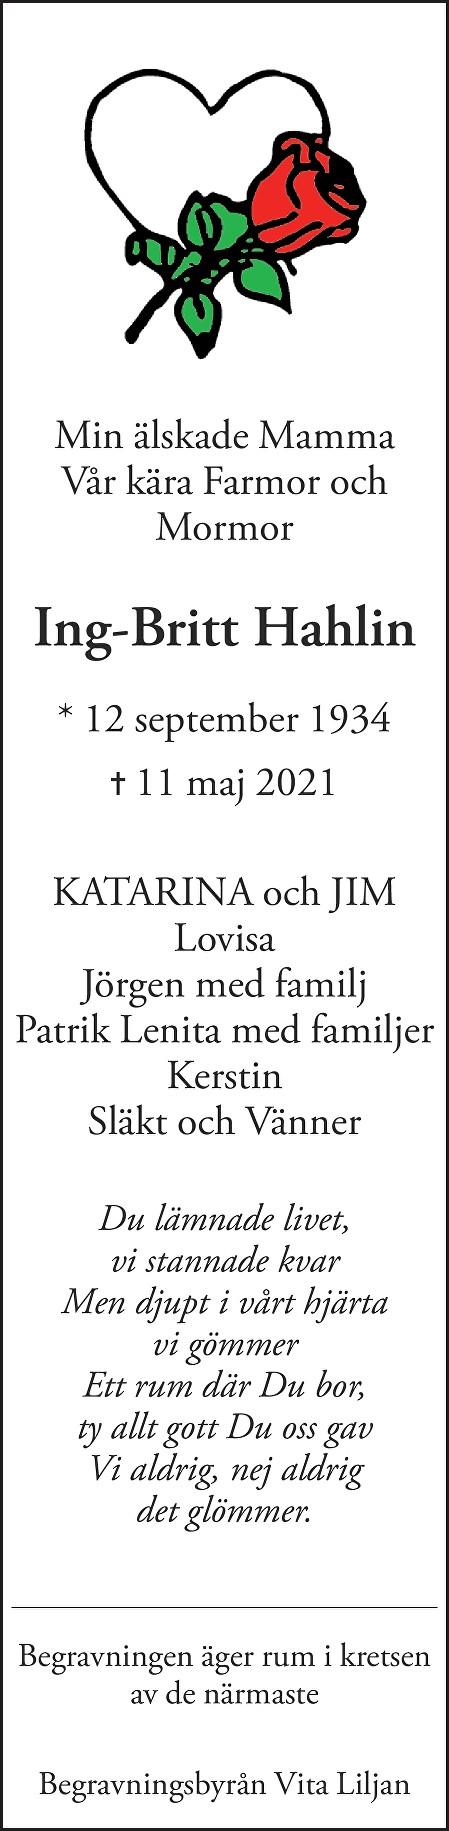 Ing-Britt Hahlin Death notice